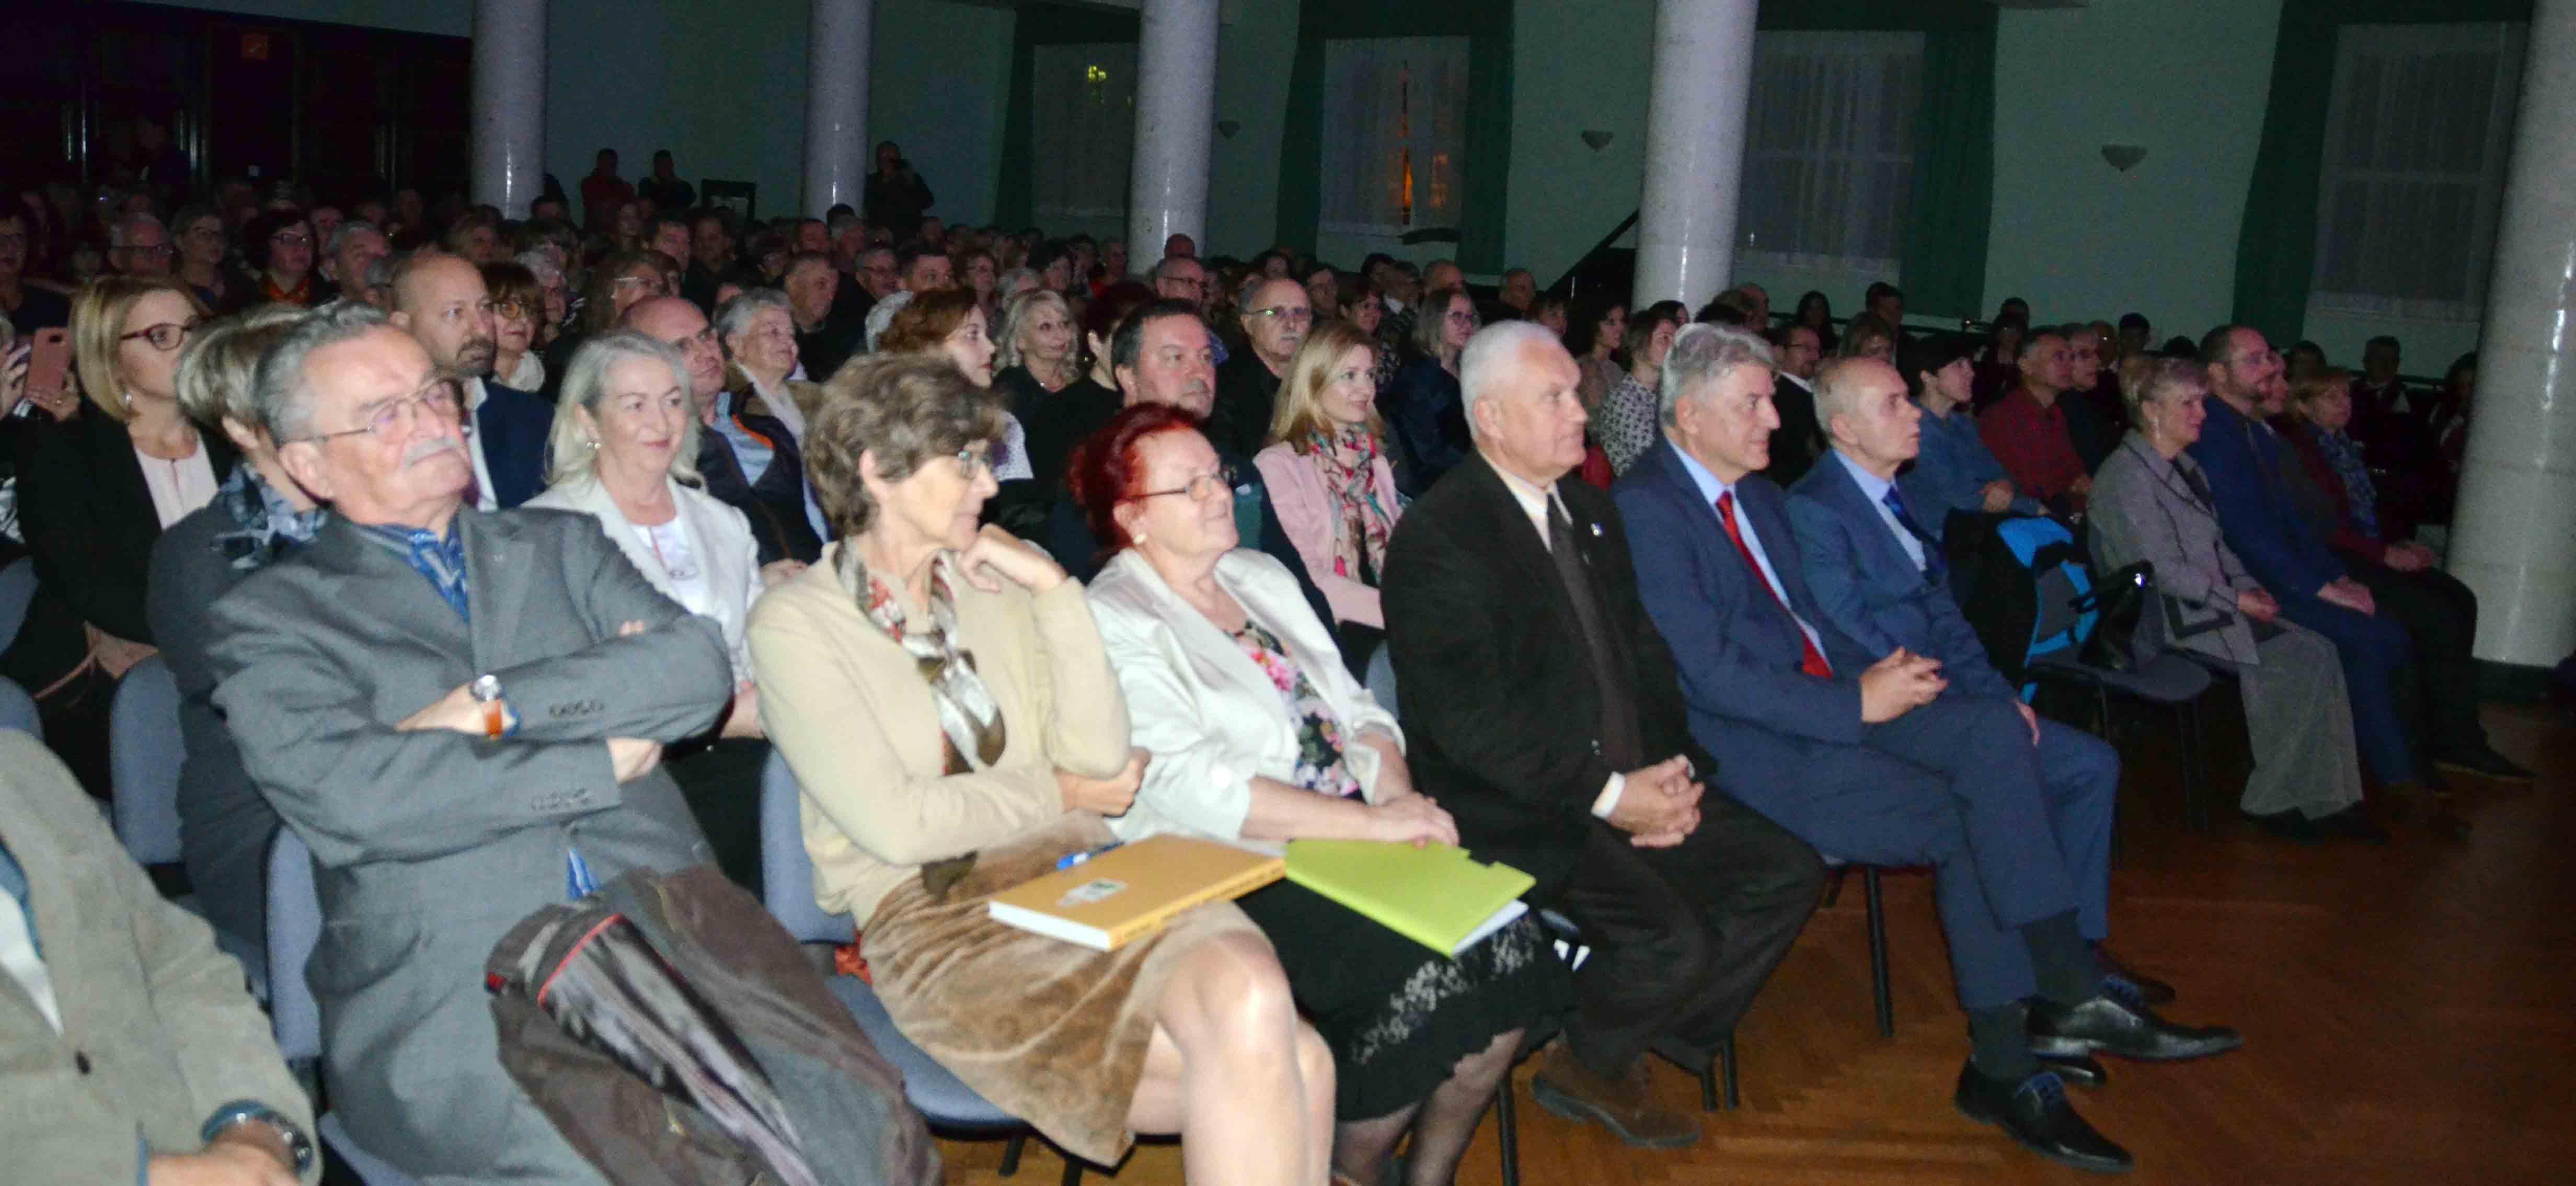 Prepuna dvrana Radničkog doma na svečarskoj fešti Radija Gorski kotar / Snimio Marinko KRMPOTIĆ